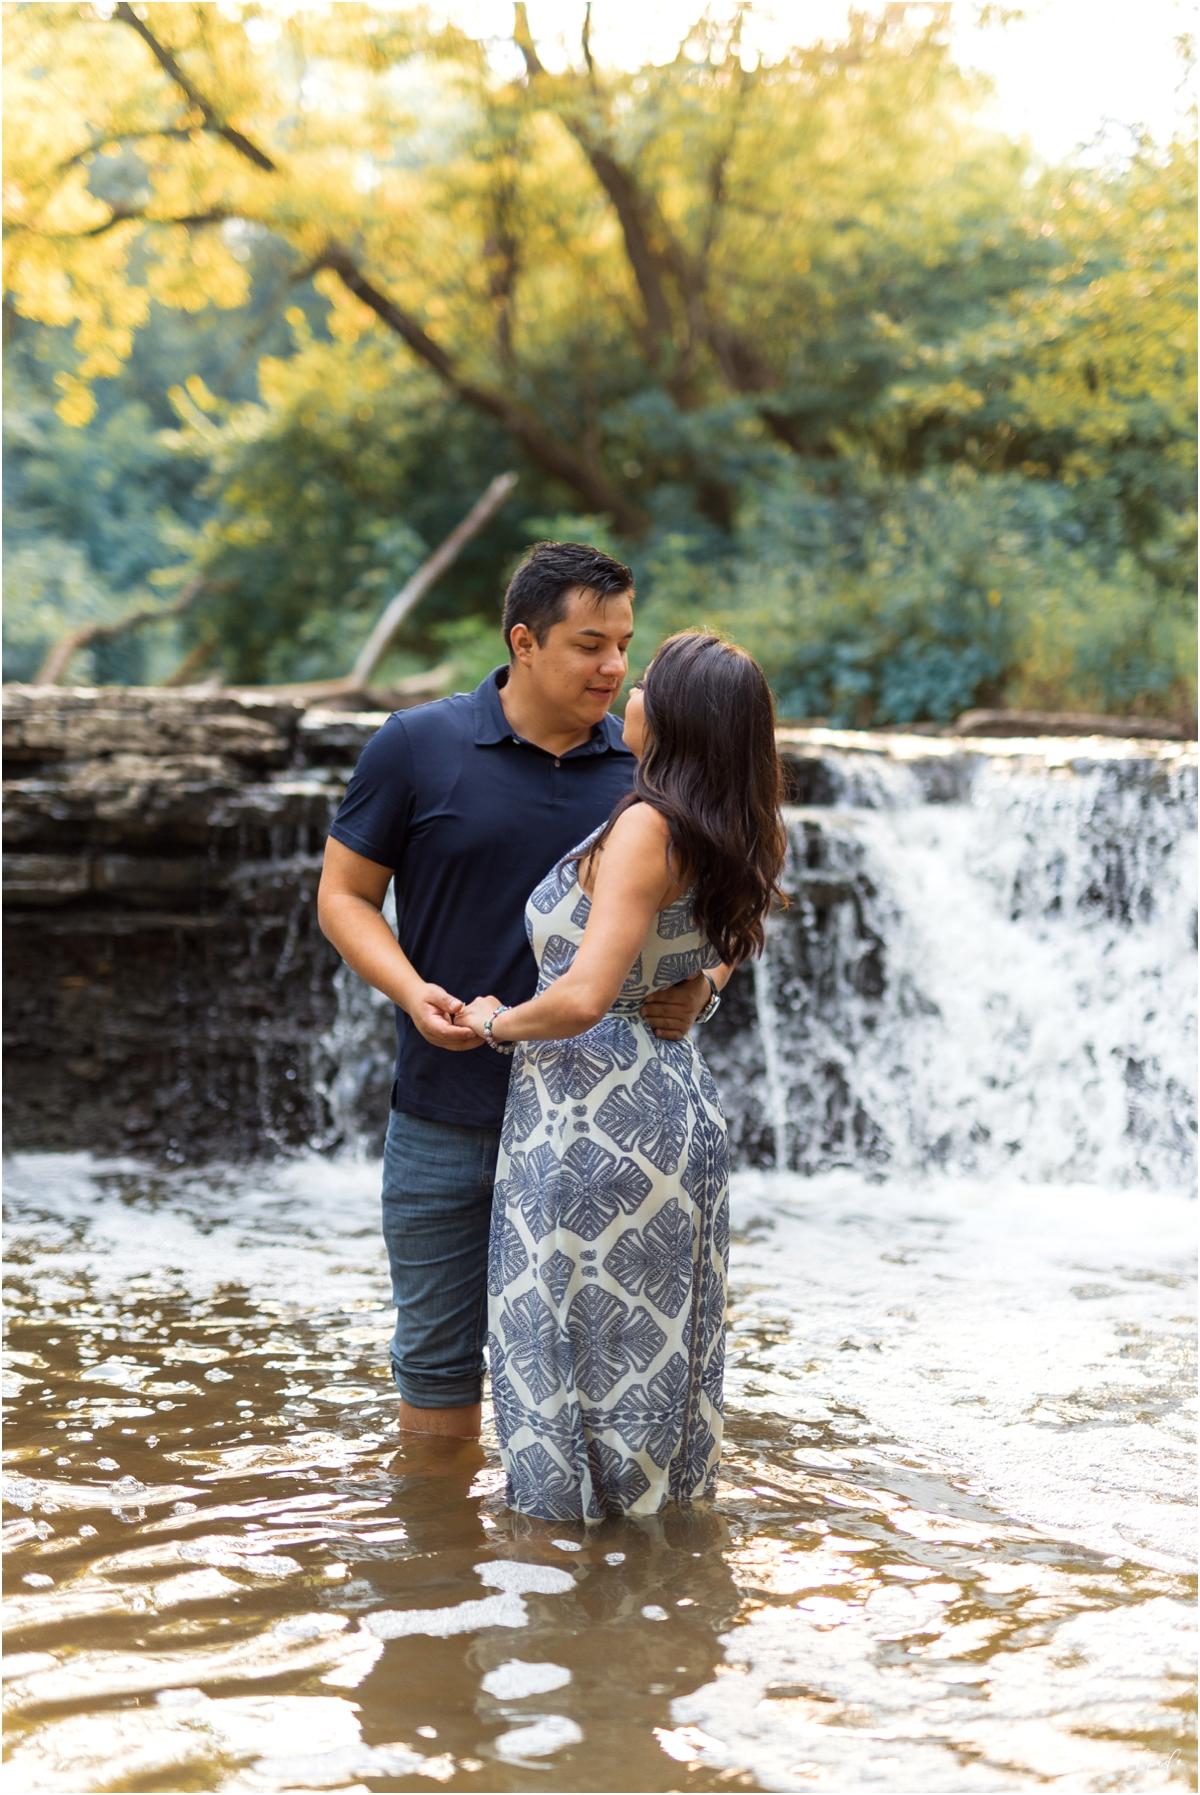 Waterfall Glenn Engagement Session, Lemont Illinois Engagement Session, Chicago Wedding Photographer, Naperville Wedding Photographer, Aurora Wedding Photographer38.jpg